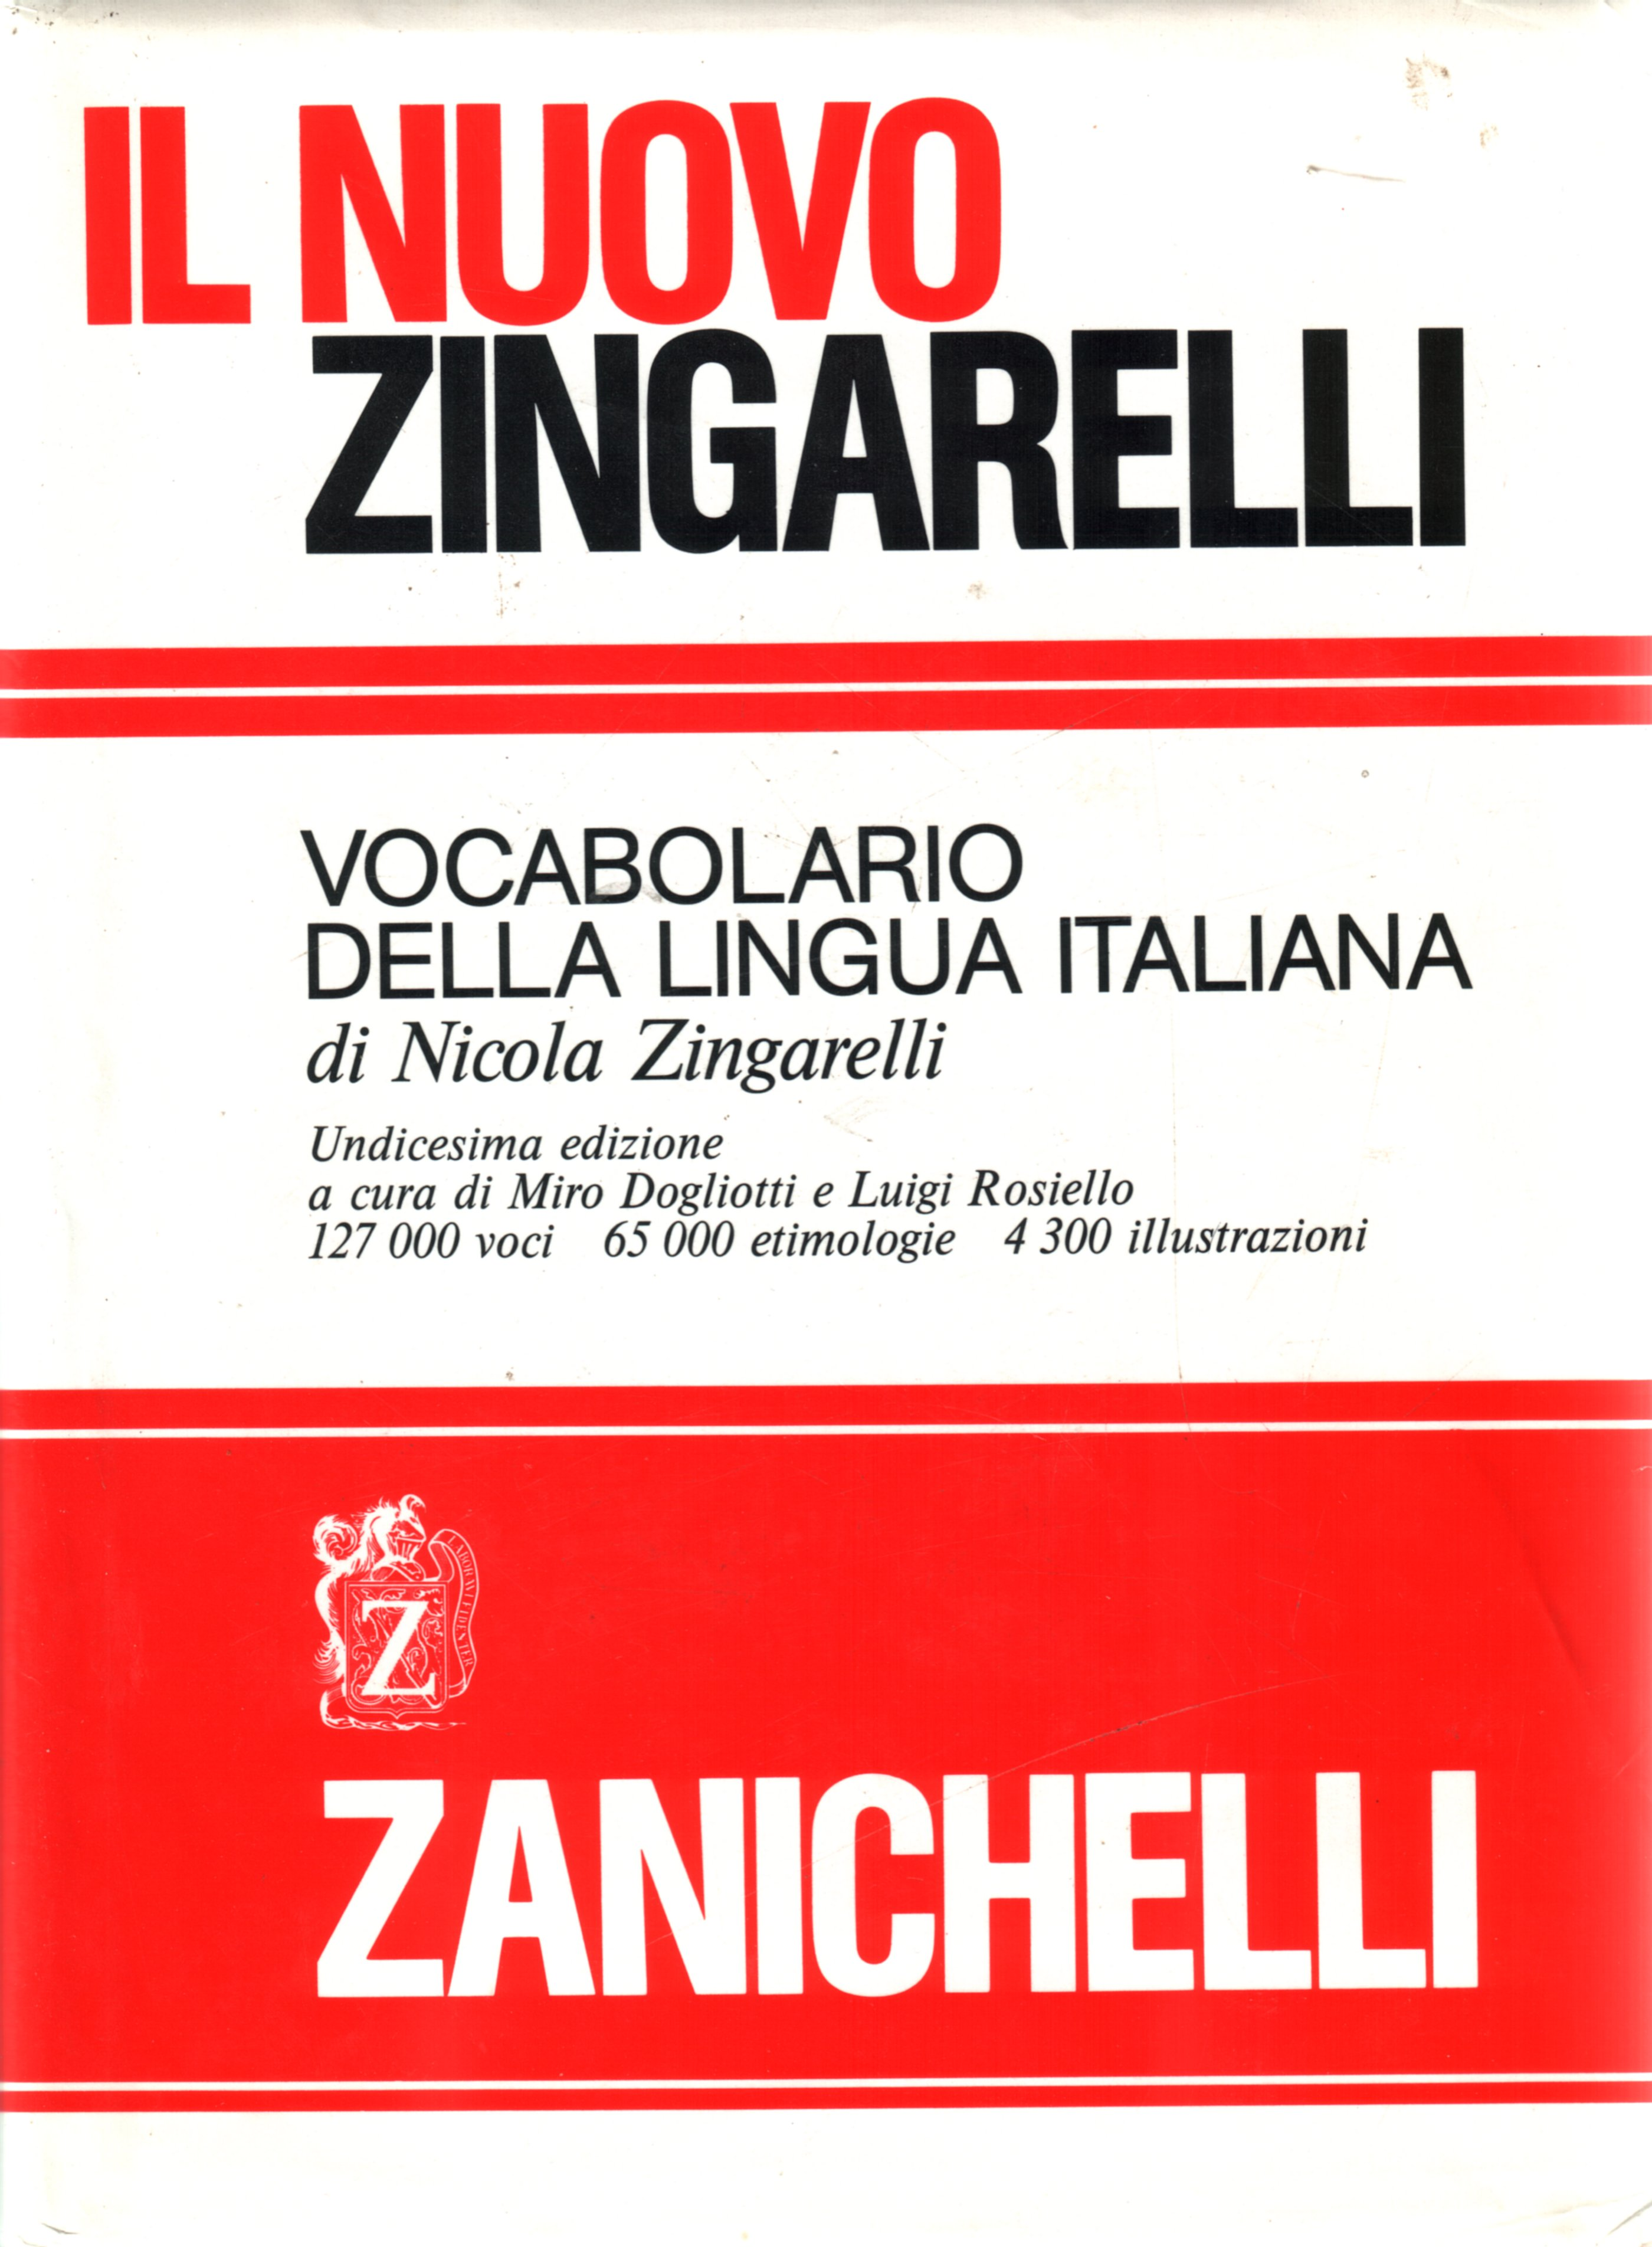 Il nuovo Zingarelli